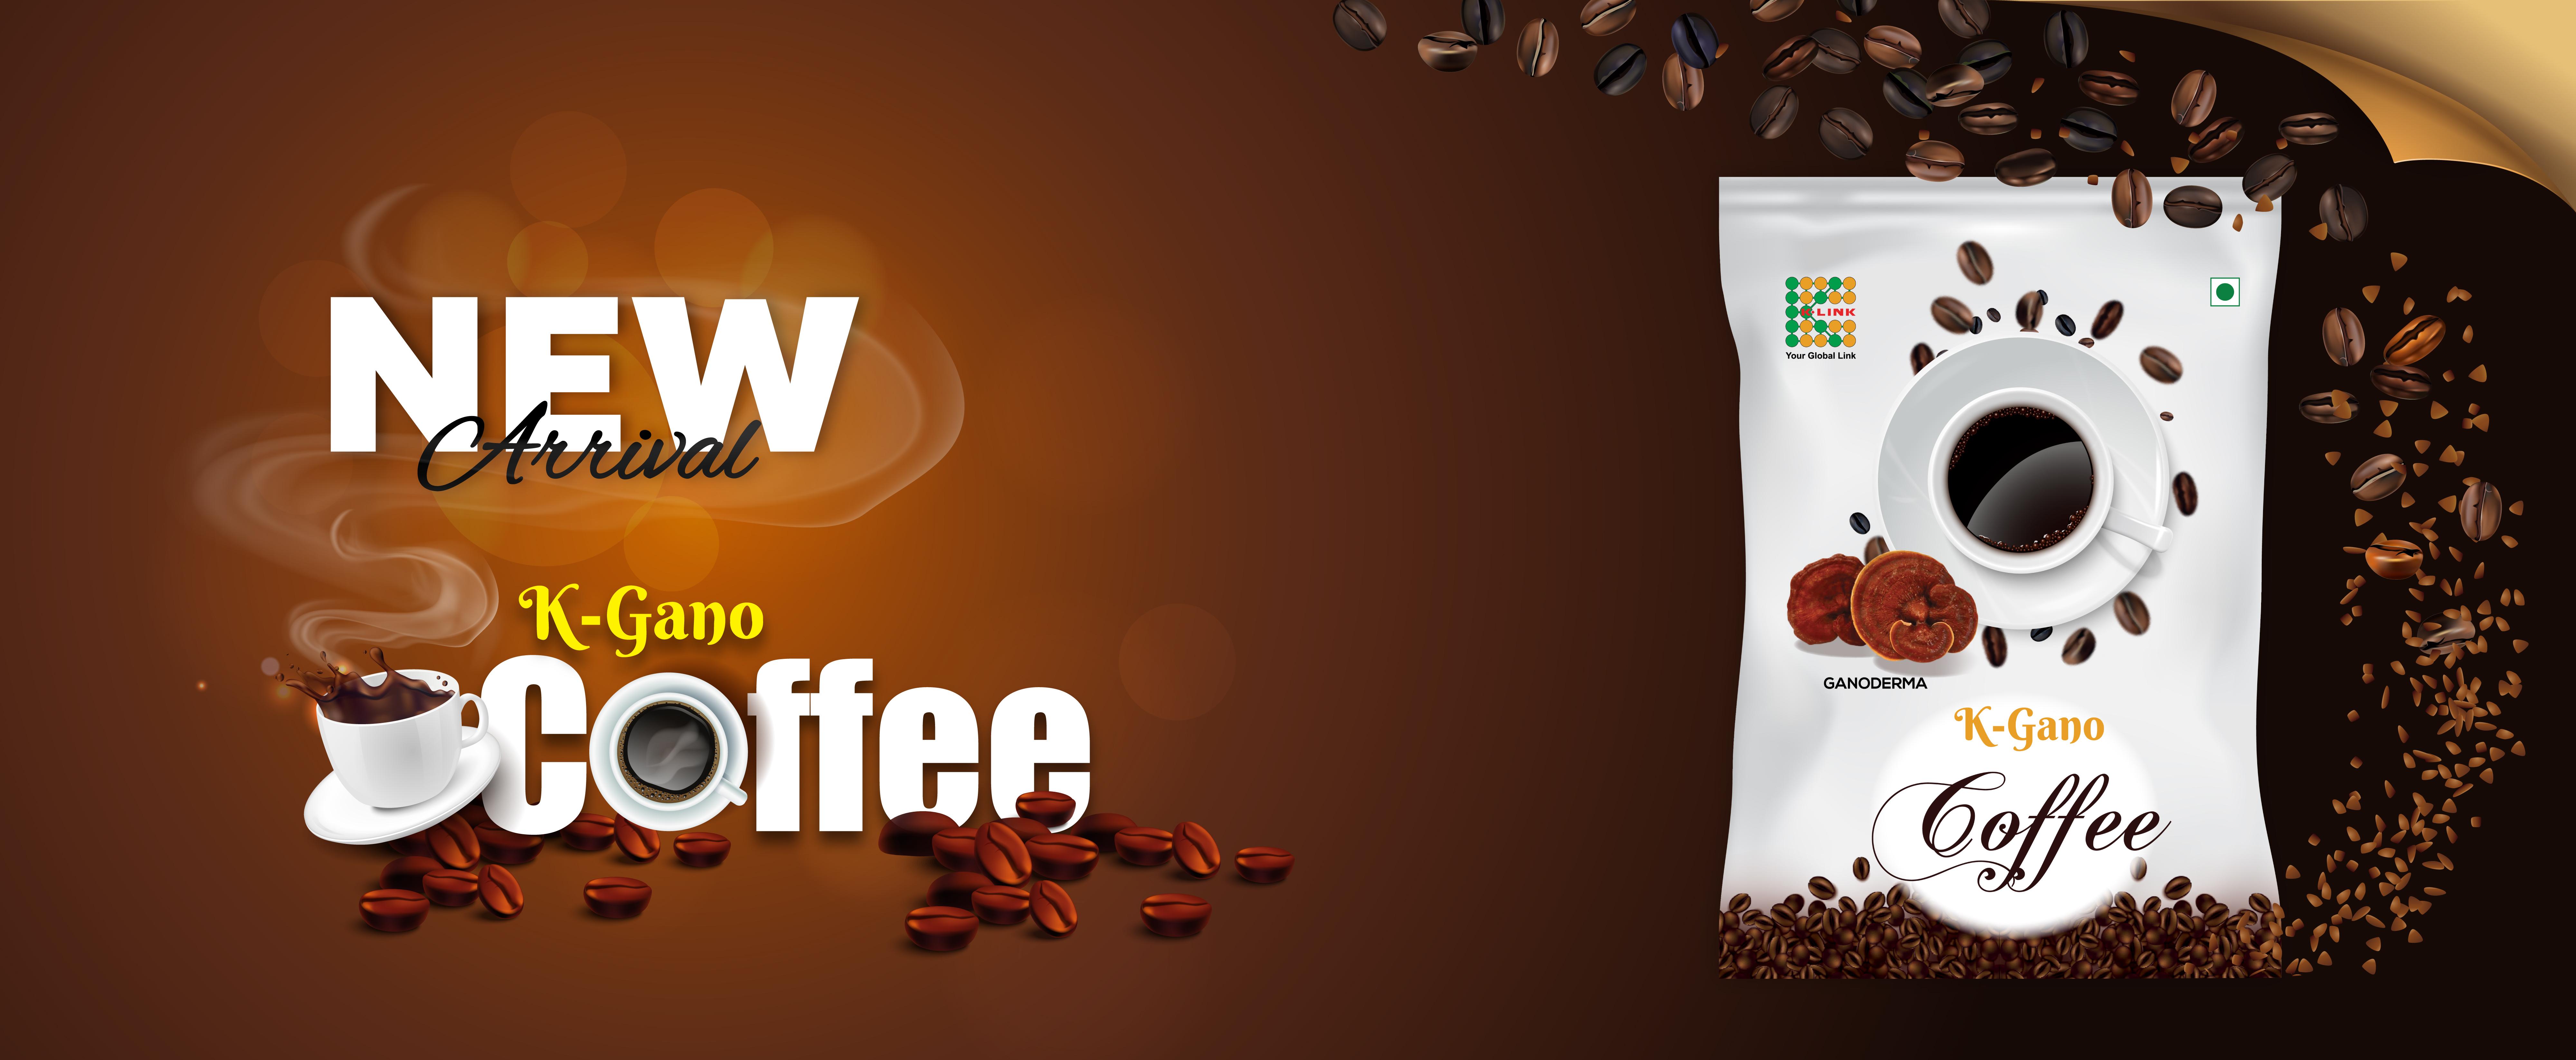 Gano Coffee